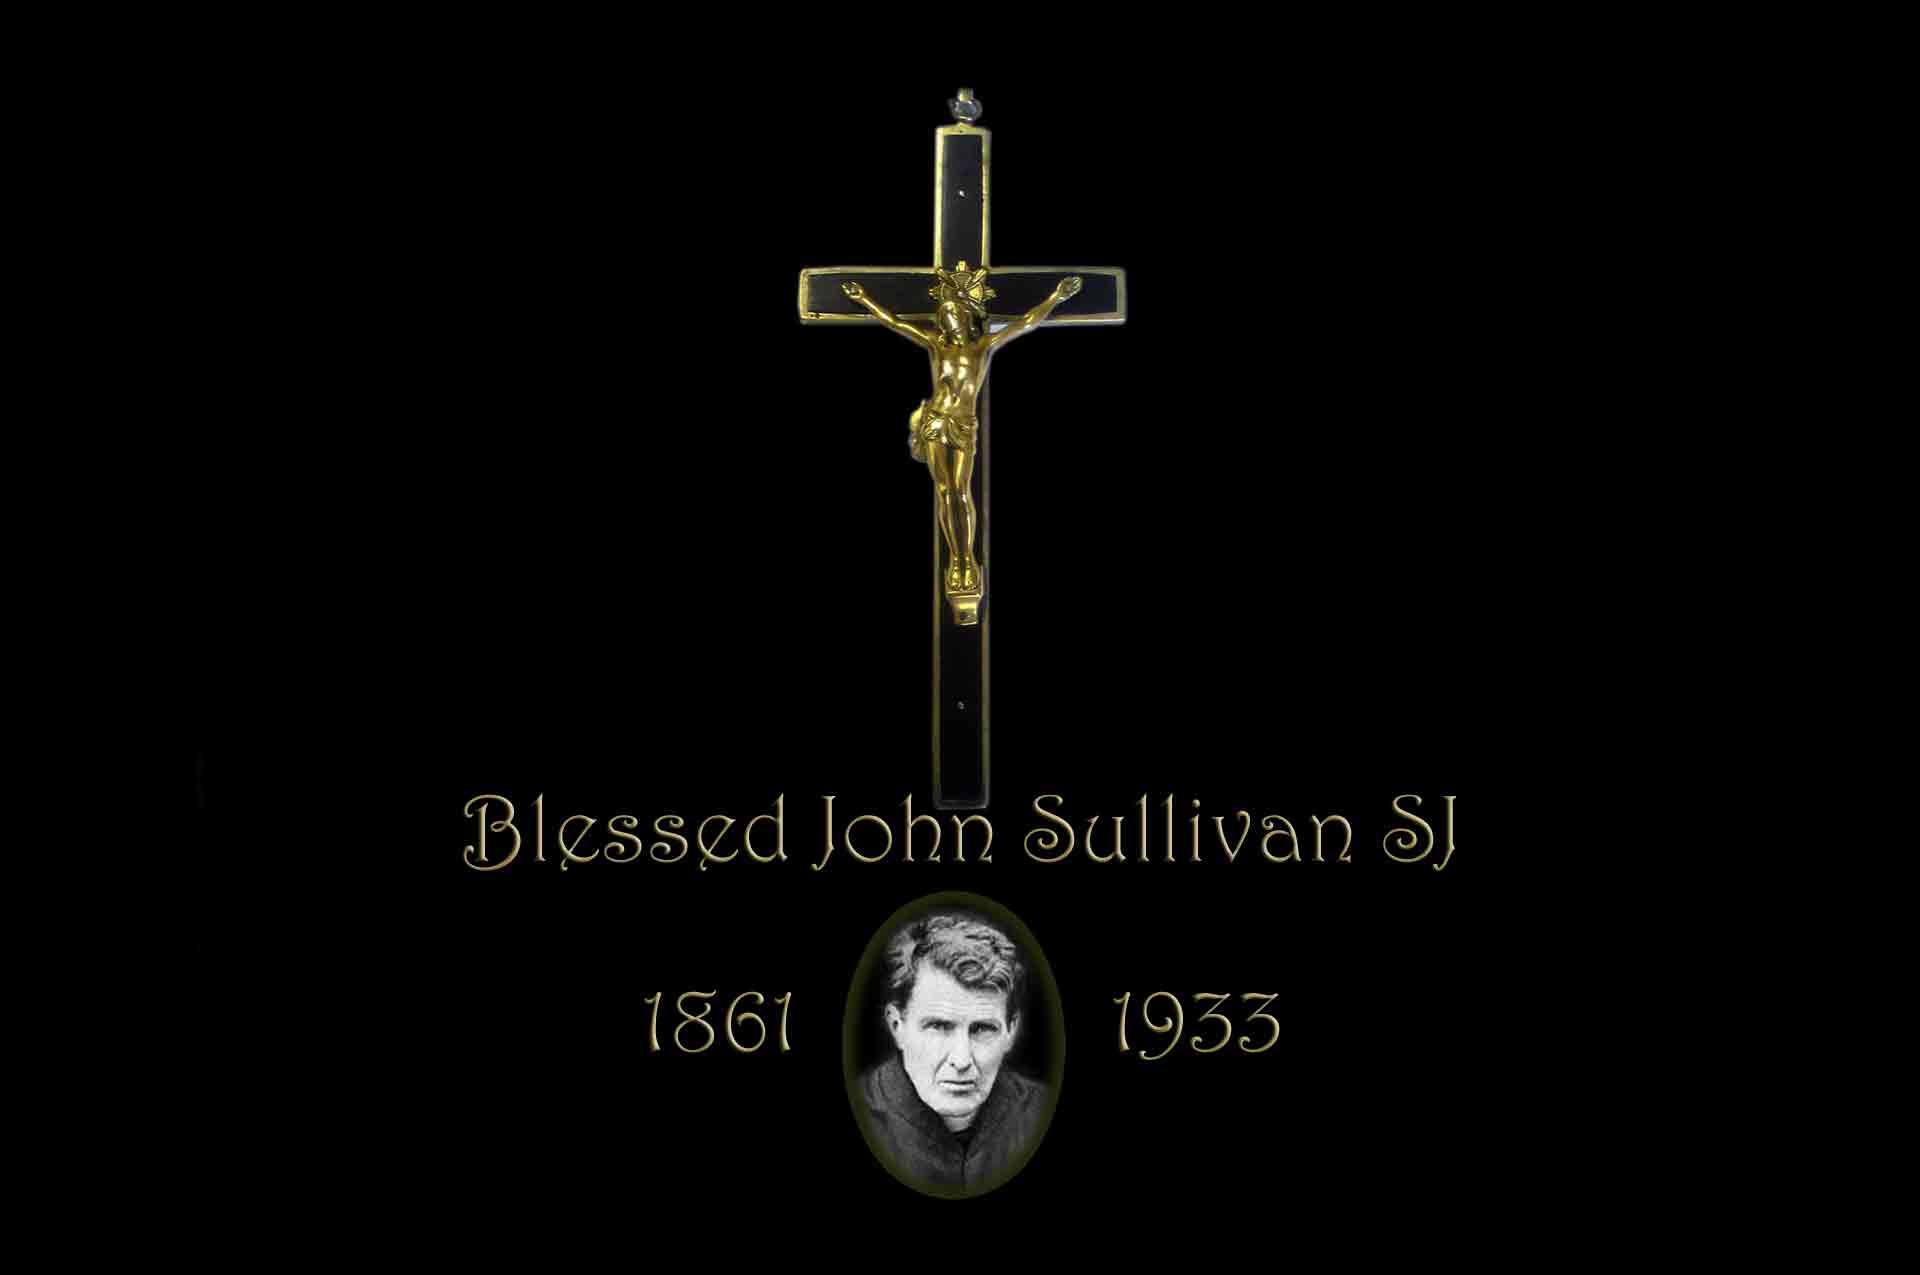 Blessed John Sullivan Annual Mass @ St Francis Xavier Church | Dublin | County Dublin | Ireland